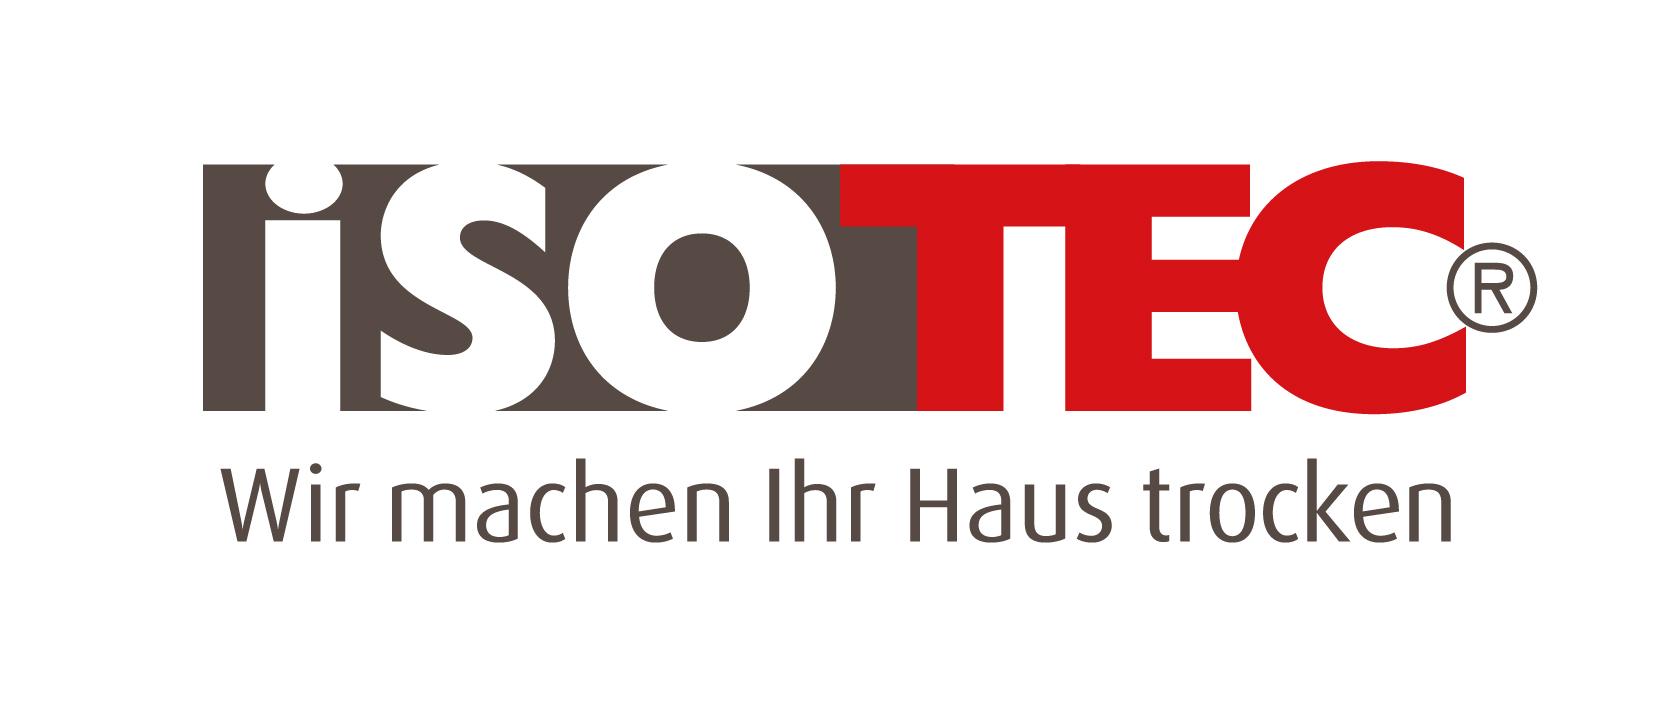 ISOTEC-Fachbetrieb Abdichtungssysteme Andreas Zettel